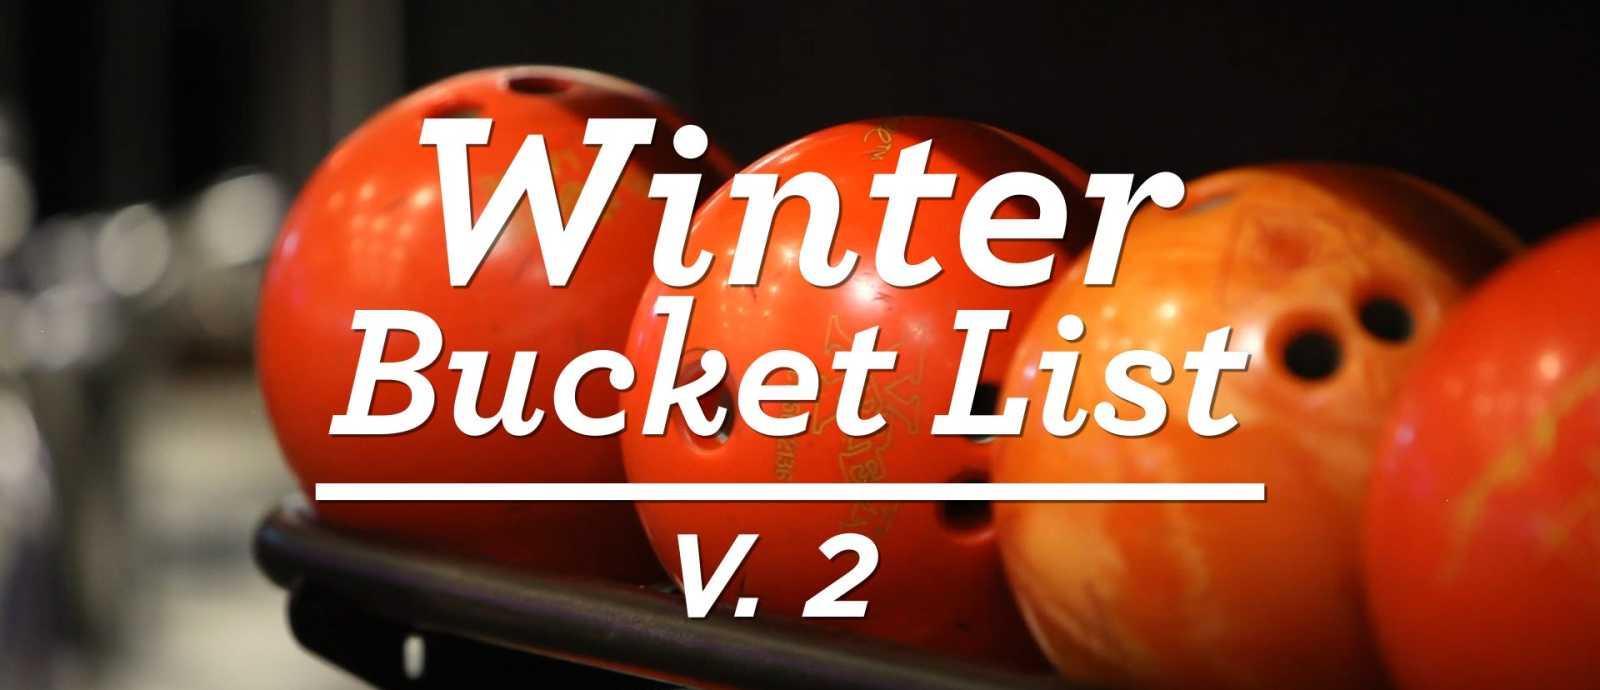 Hamilton County Winter Bucket List V. 2